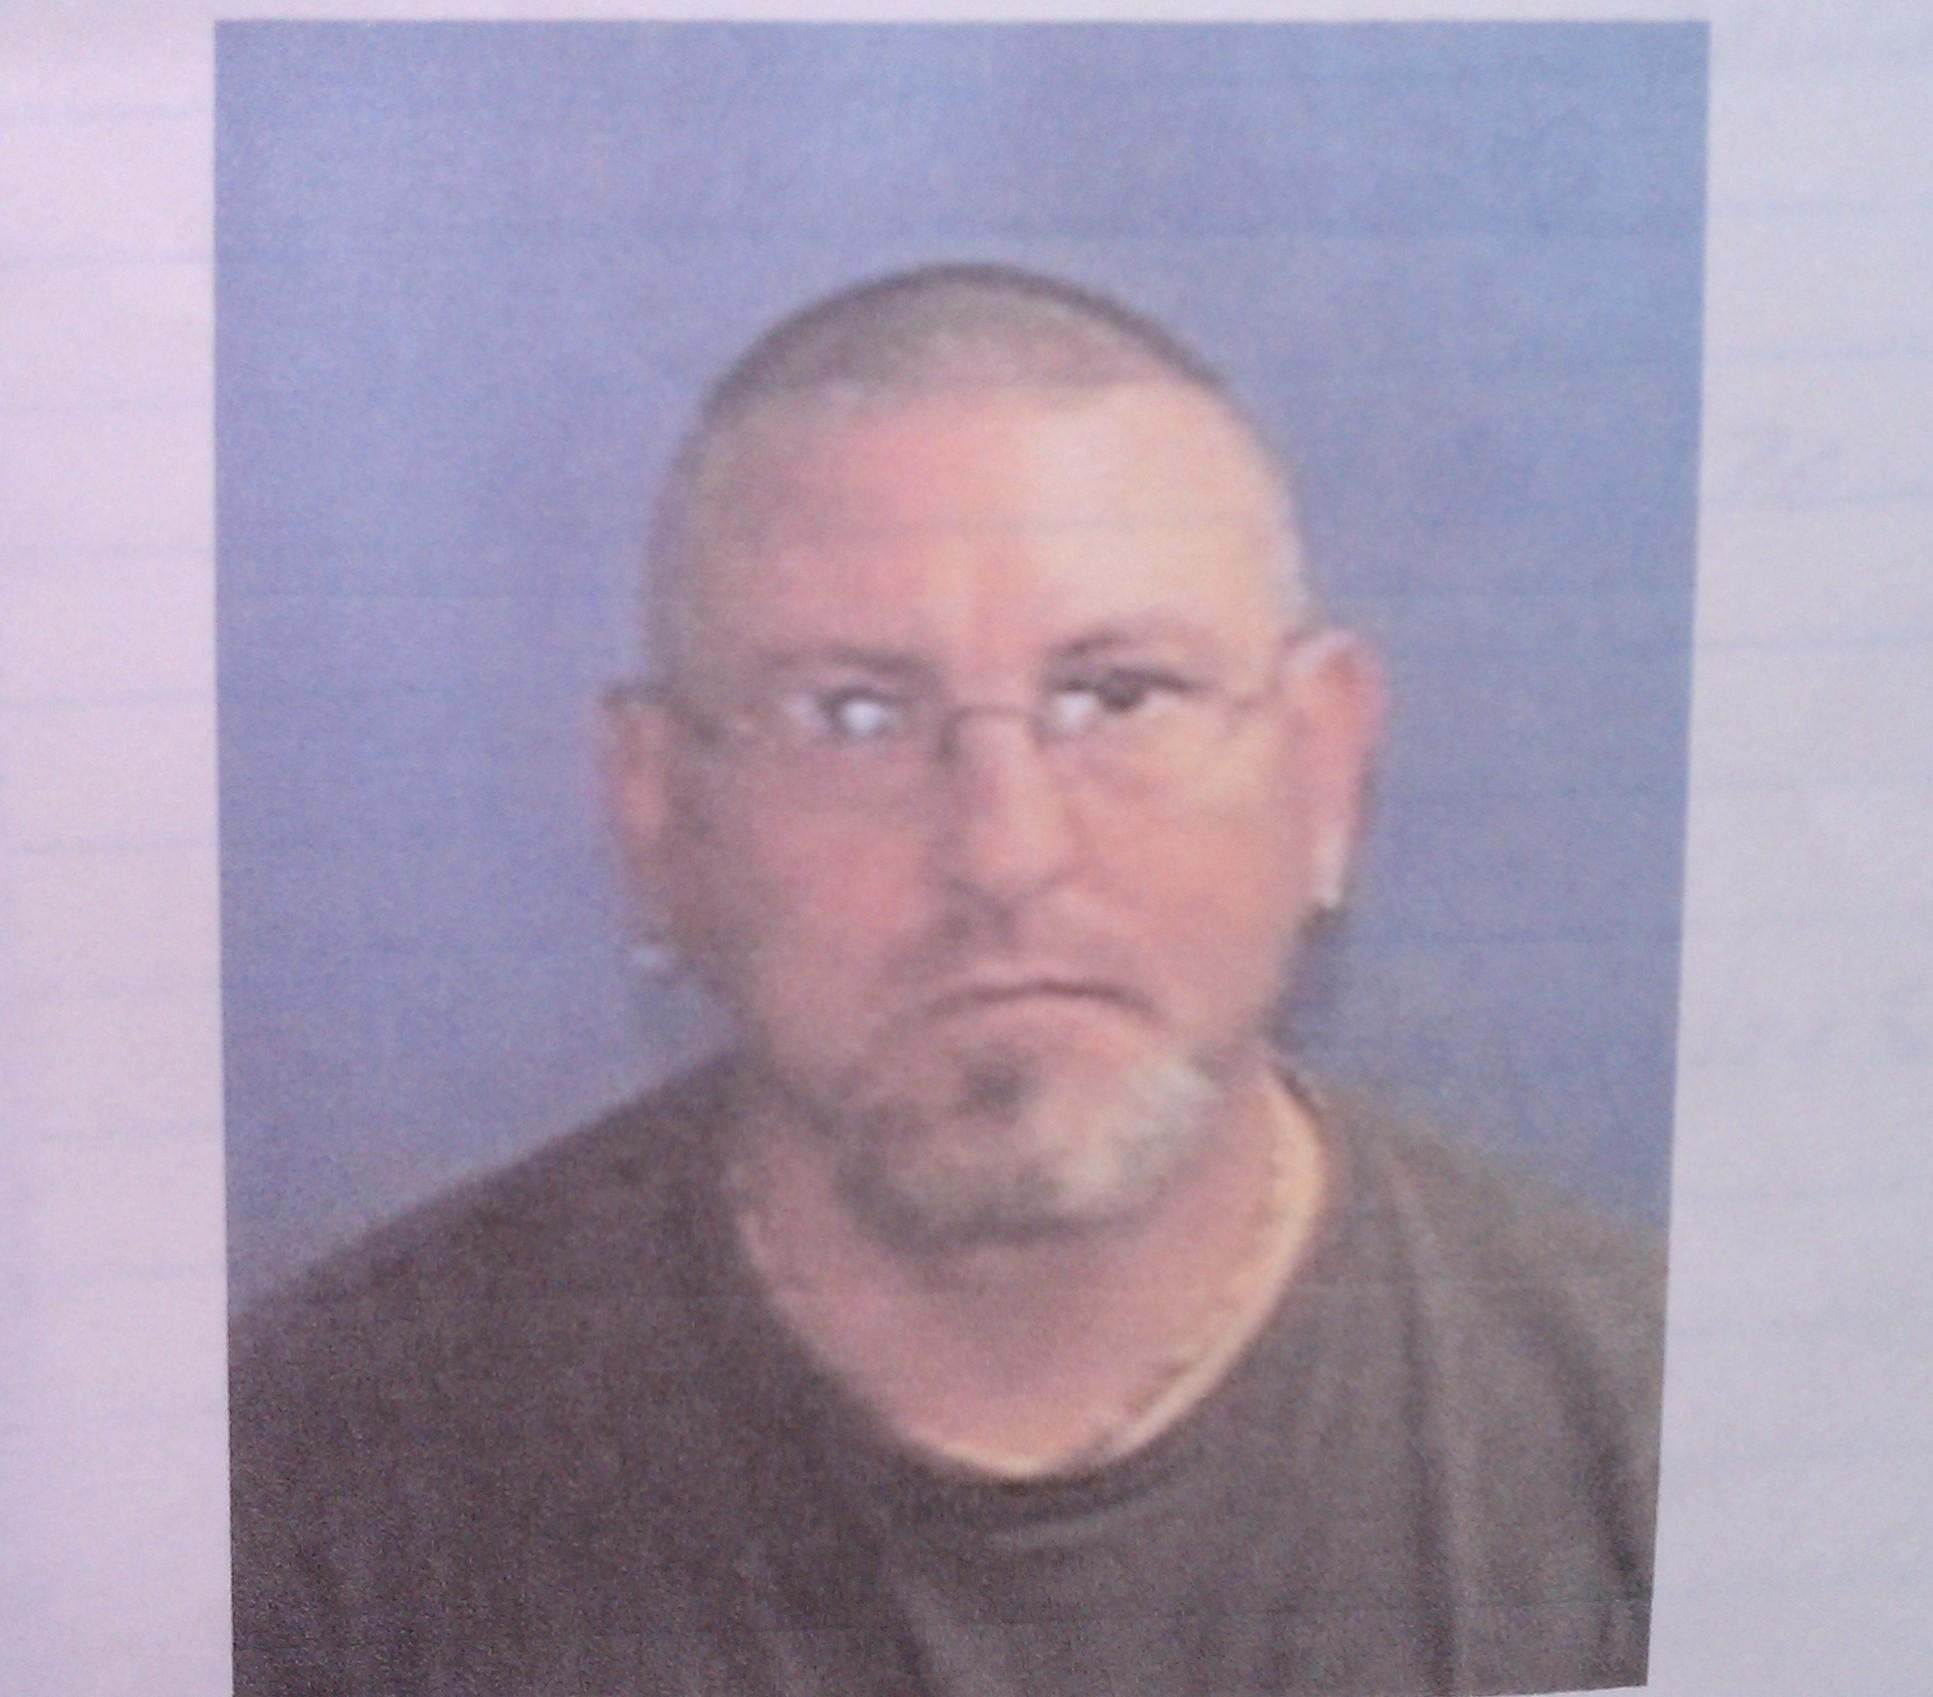 Deputies say David Johnson currently does not have facial hair